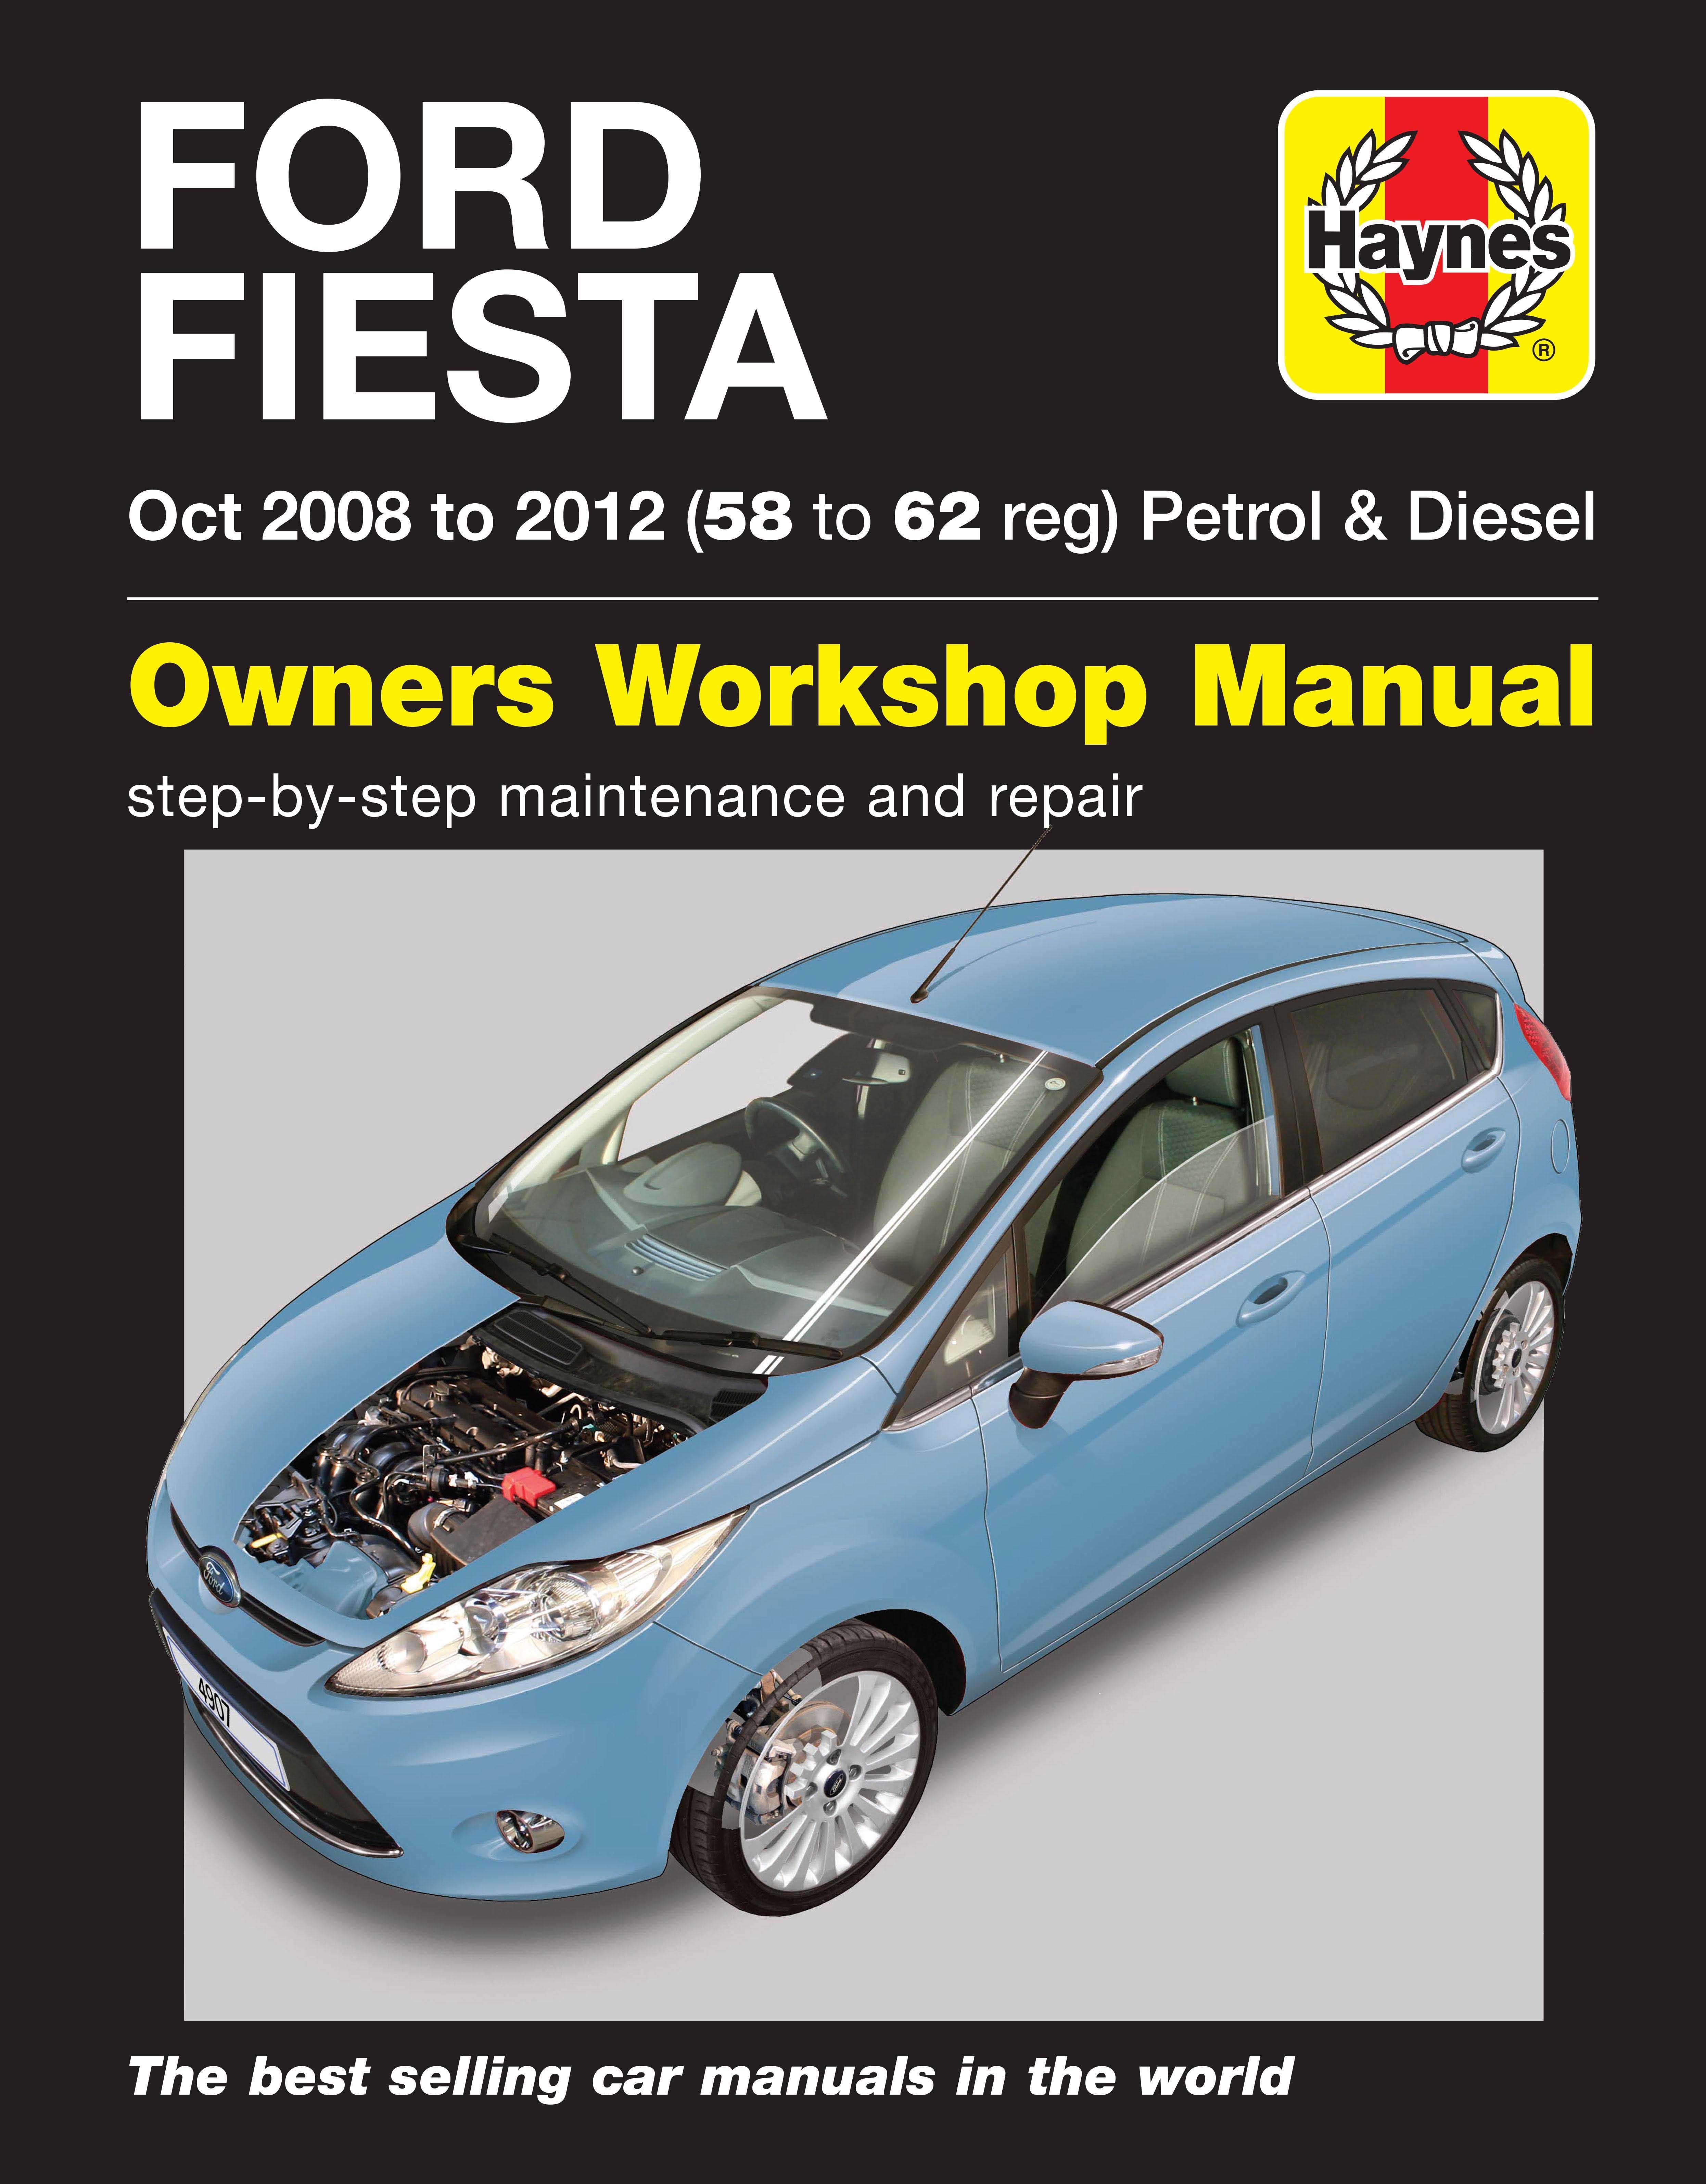 Haynes Manual Ford Fiesta 2011 User Guide That Easy To Read Fuse Box 08 11 Manua Rh Halfords Com Interior